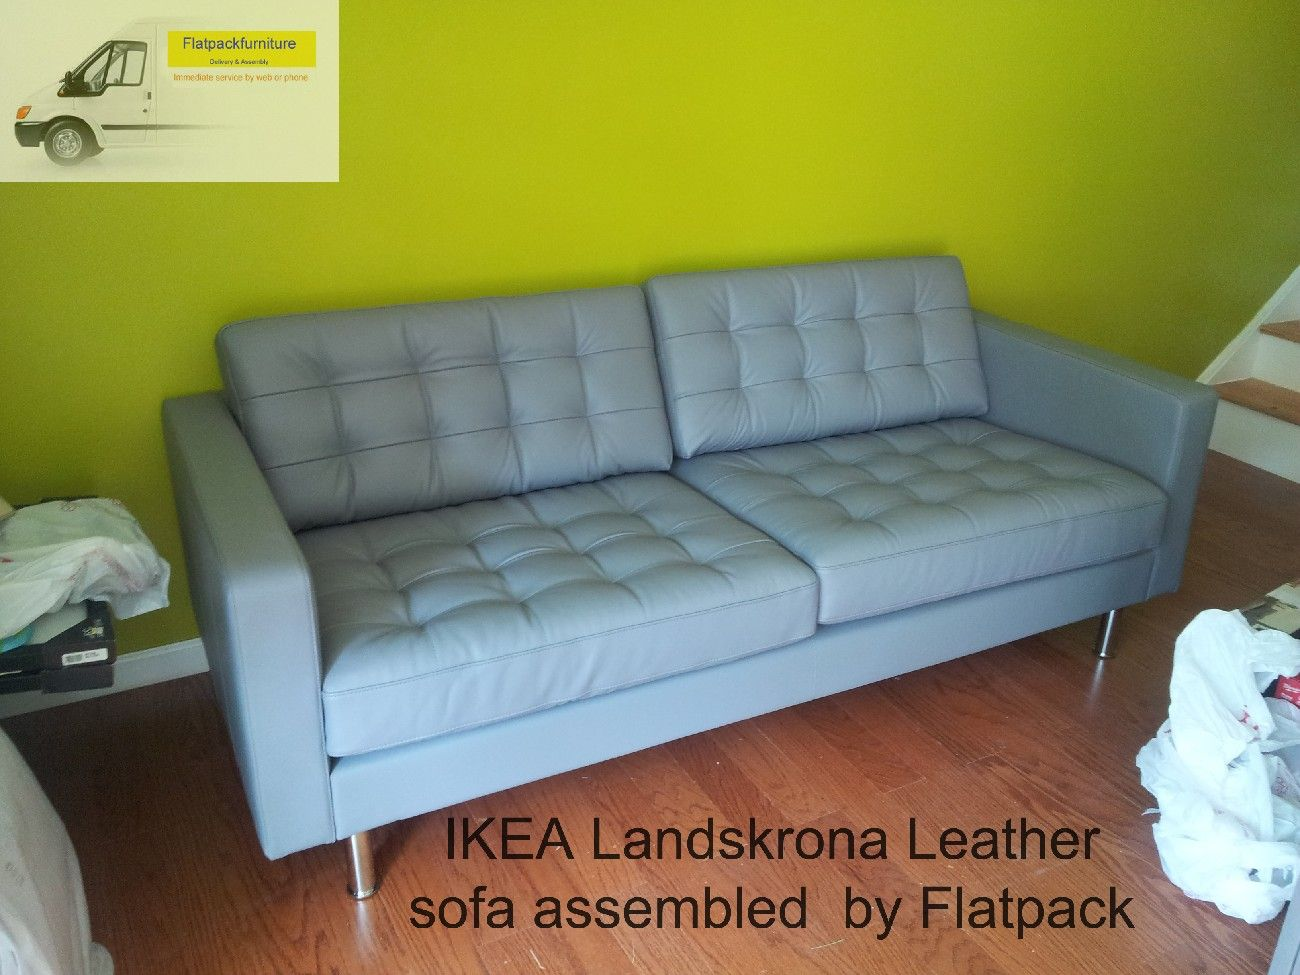 Beautiful IKEA Landskrona Sofa Assembled By Flatpack In Laurel. MD Https://www.